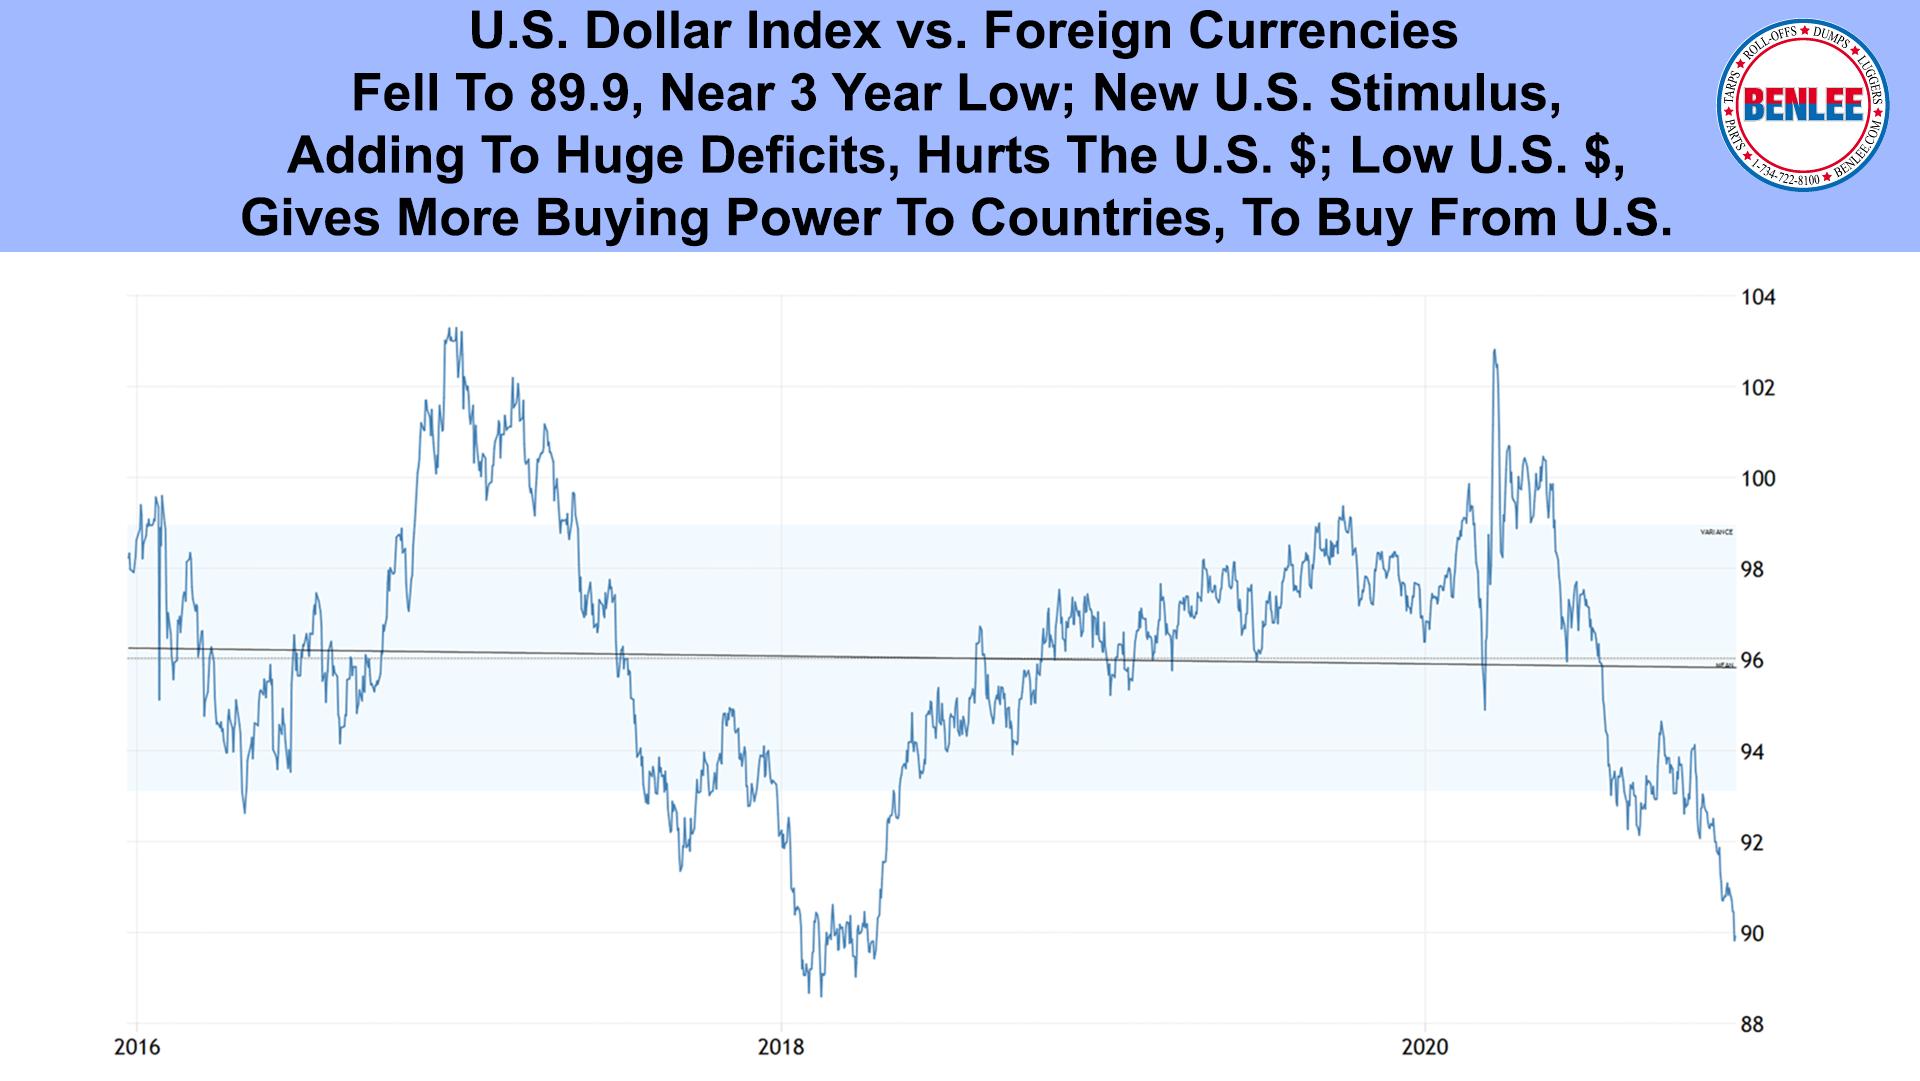 U.S. Dollar Indexr